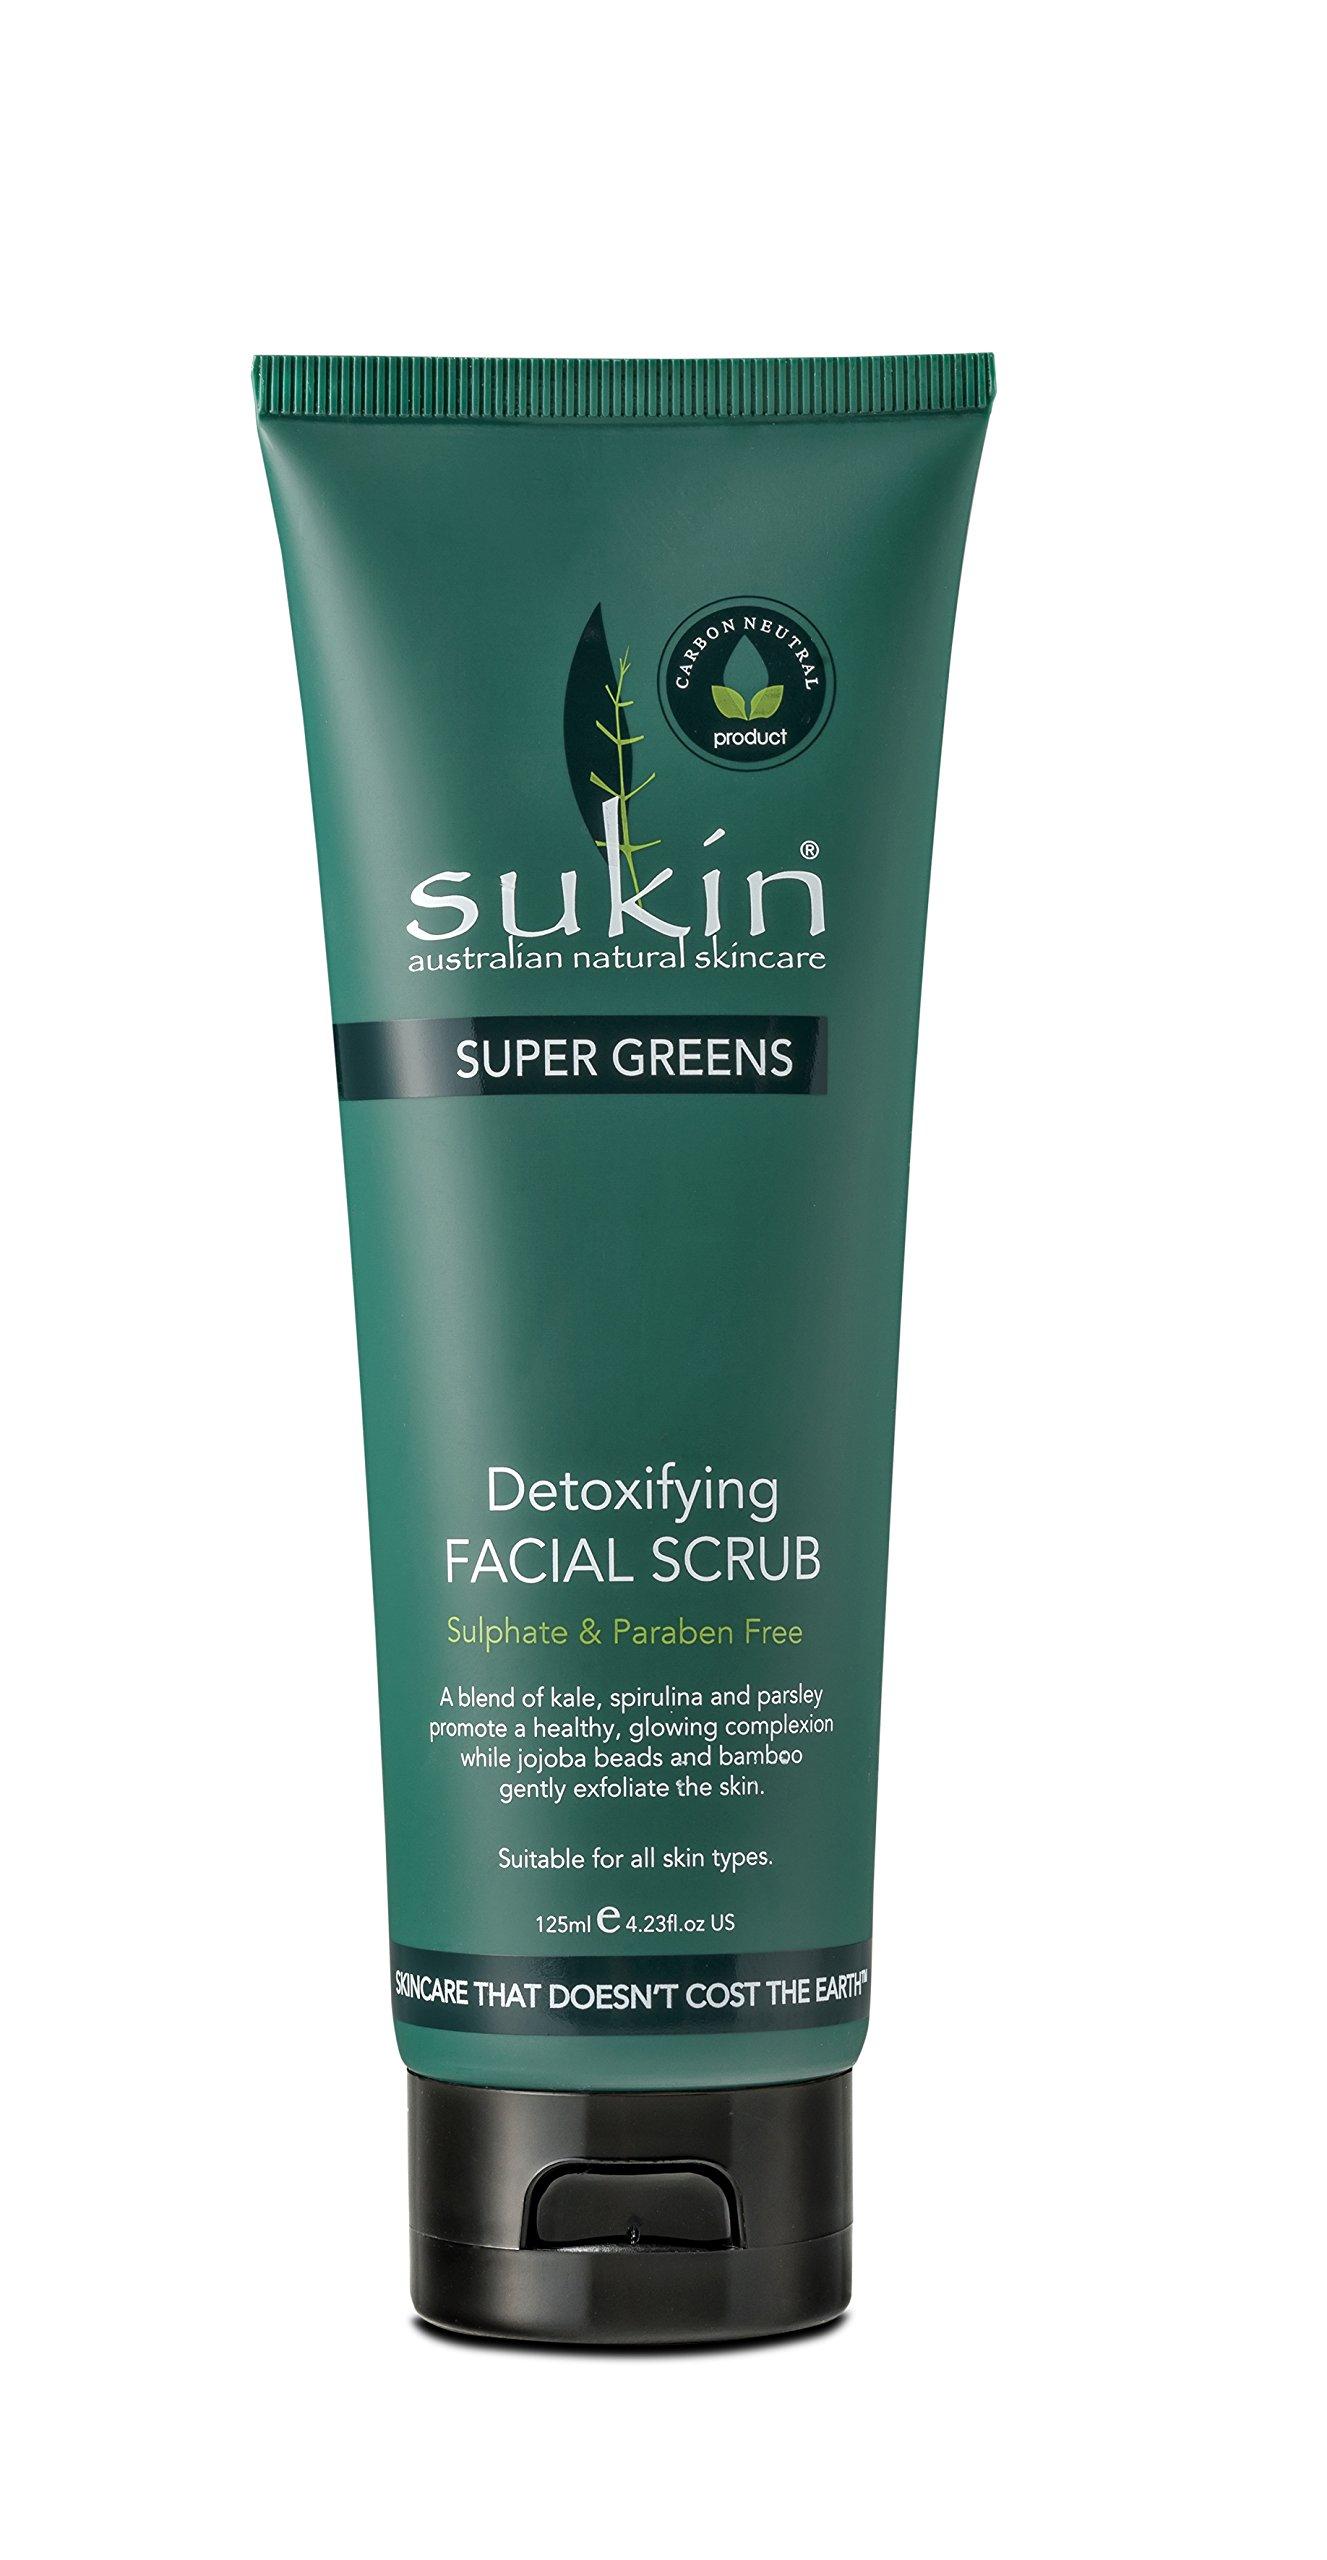 Sukin Supergreens Detox Facial Scrub by Sukin